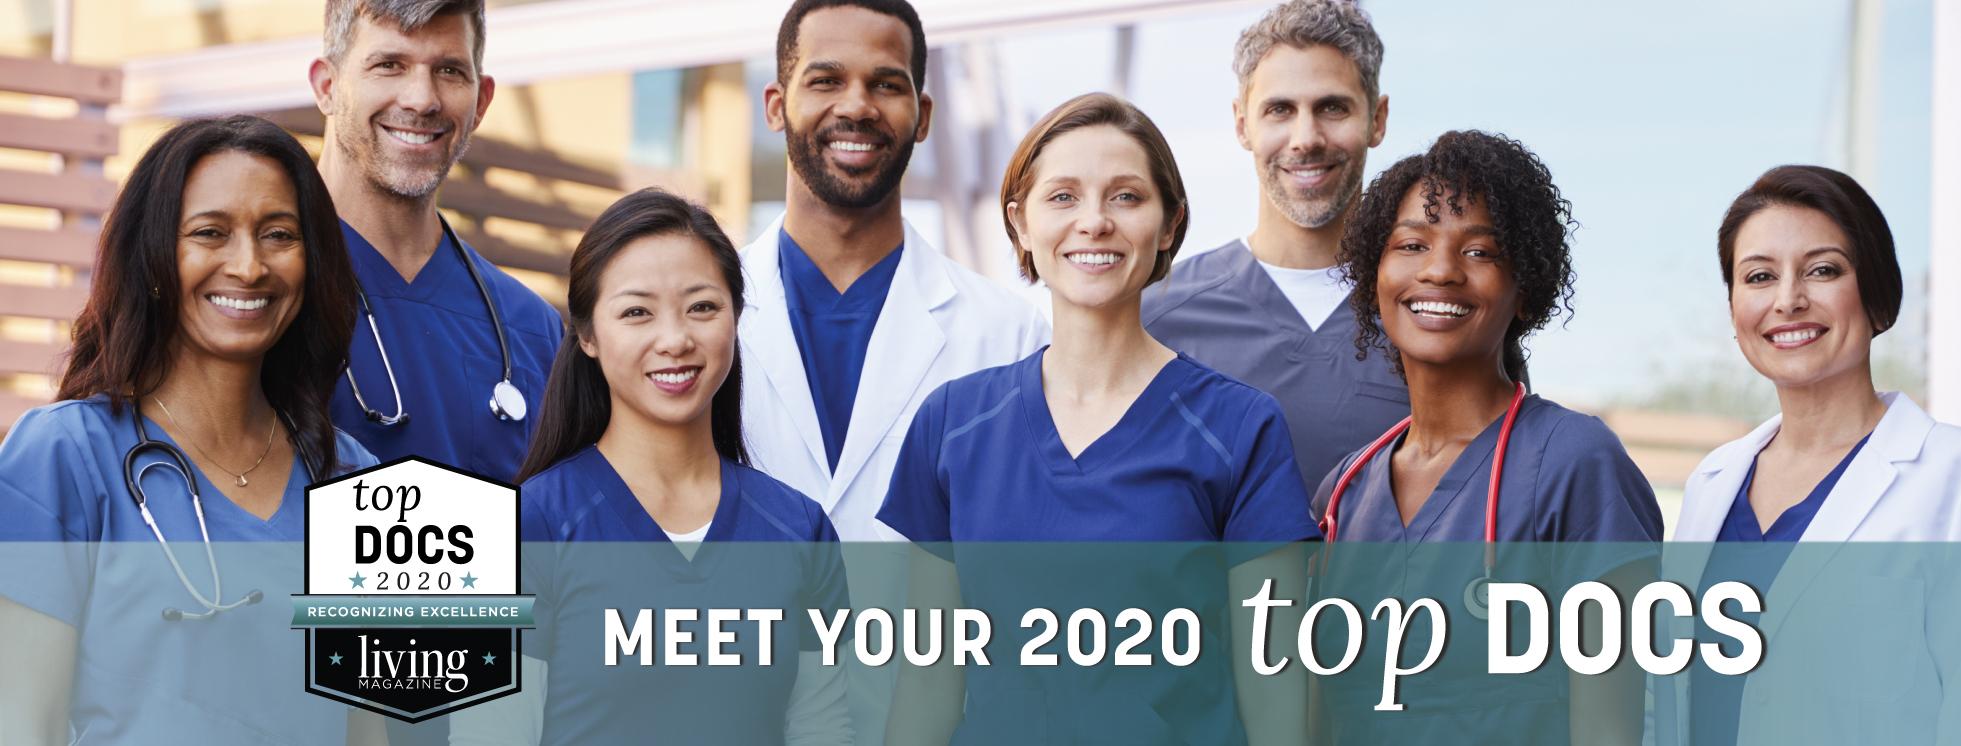 top doctorss dallas fort worth houston 2020